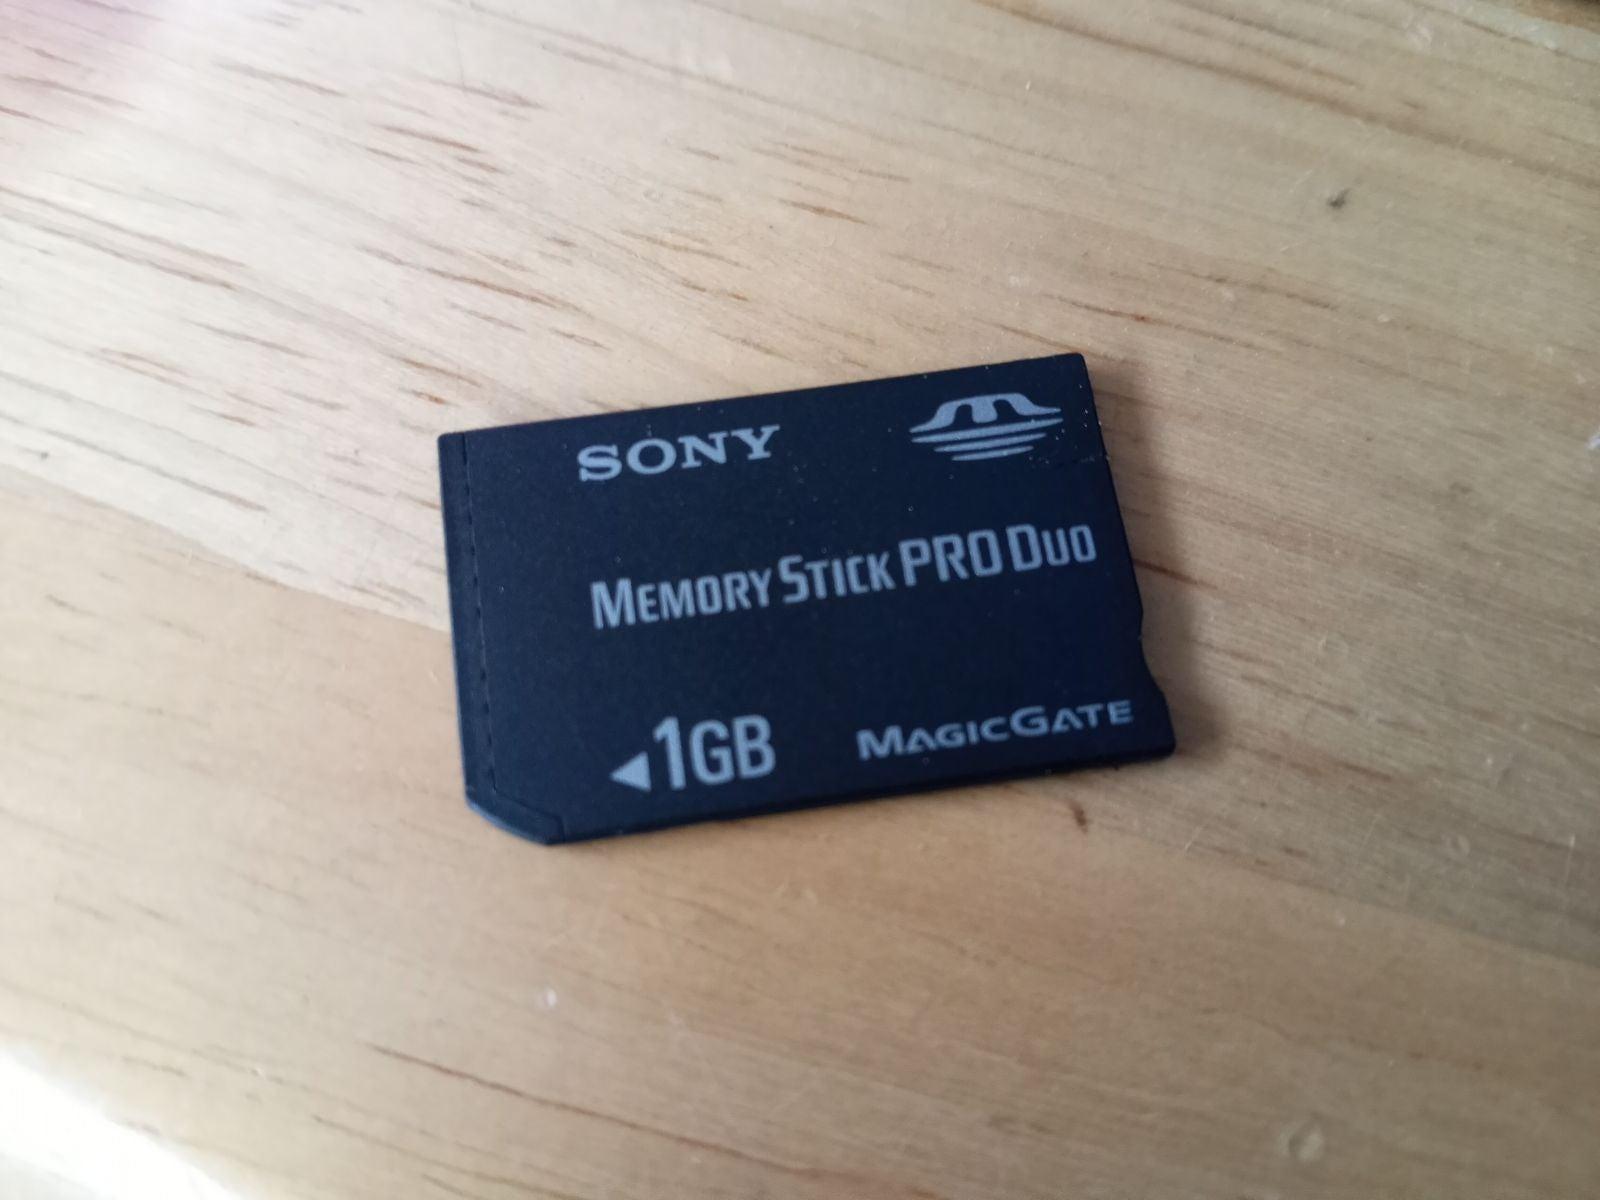 1gb memory stick pro duo PSP